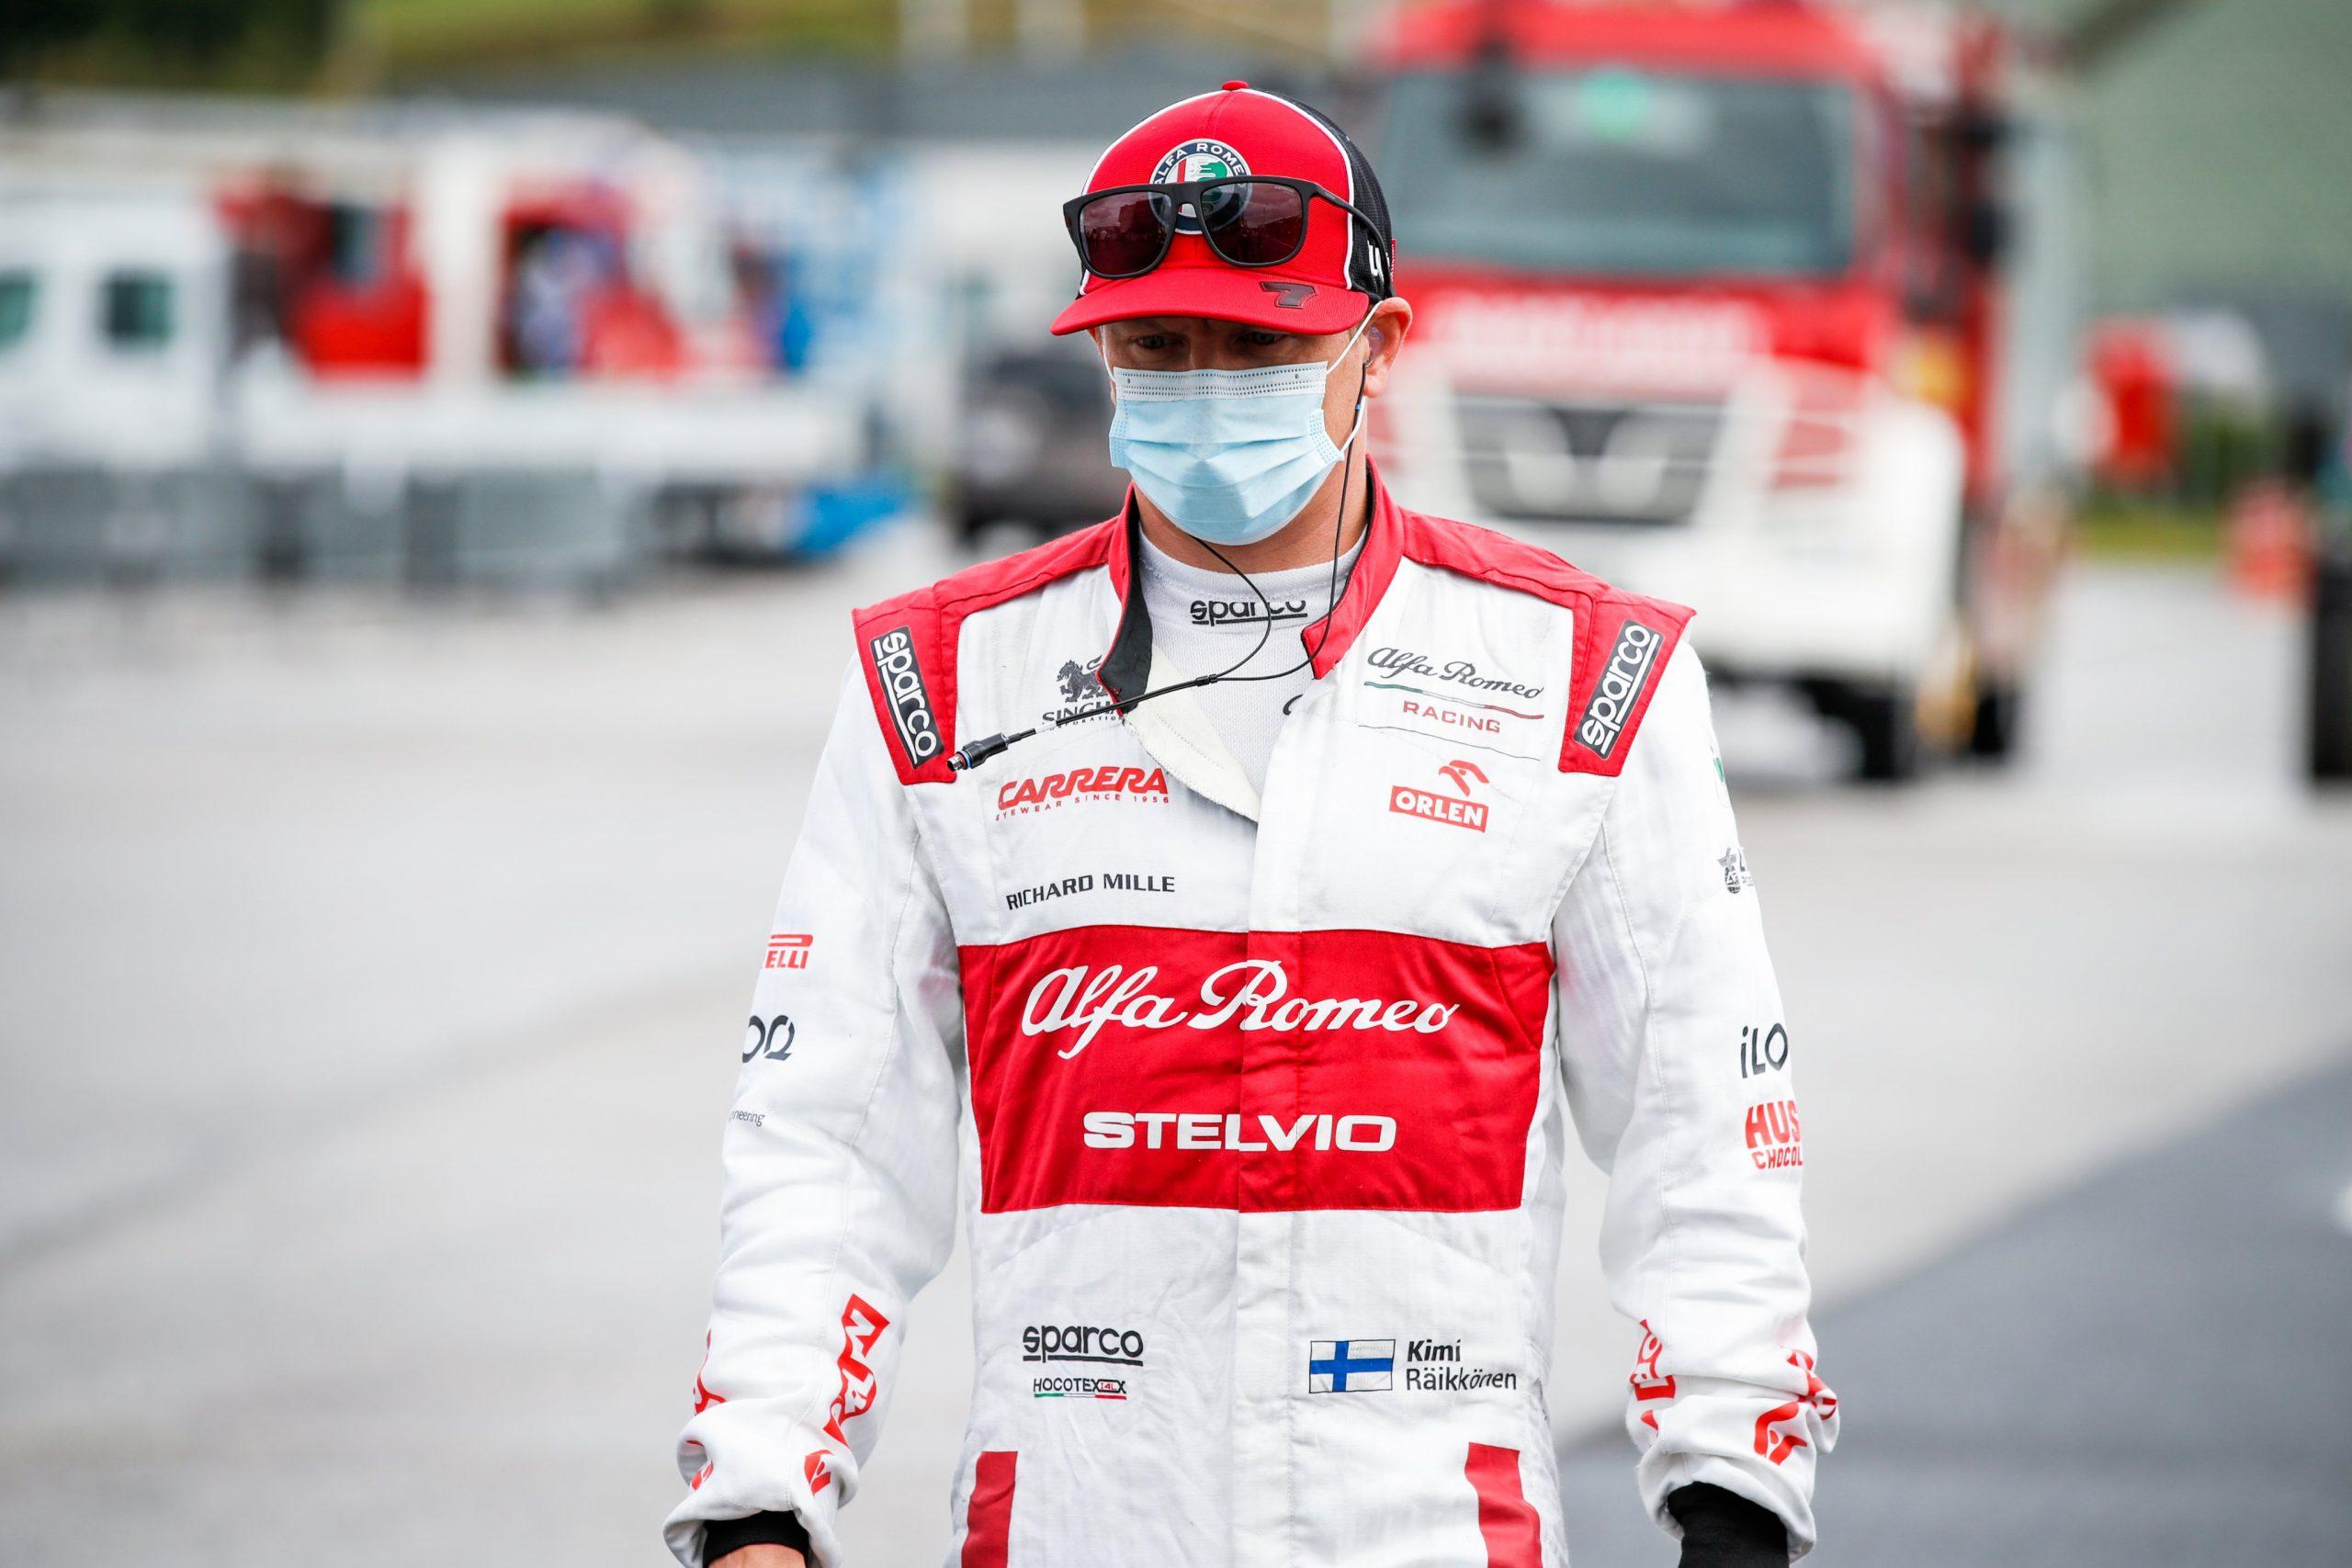 Kimi Raikkonen a battu un record de Schumacher à Silverstone 1